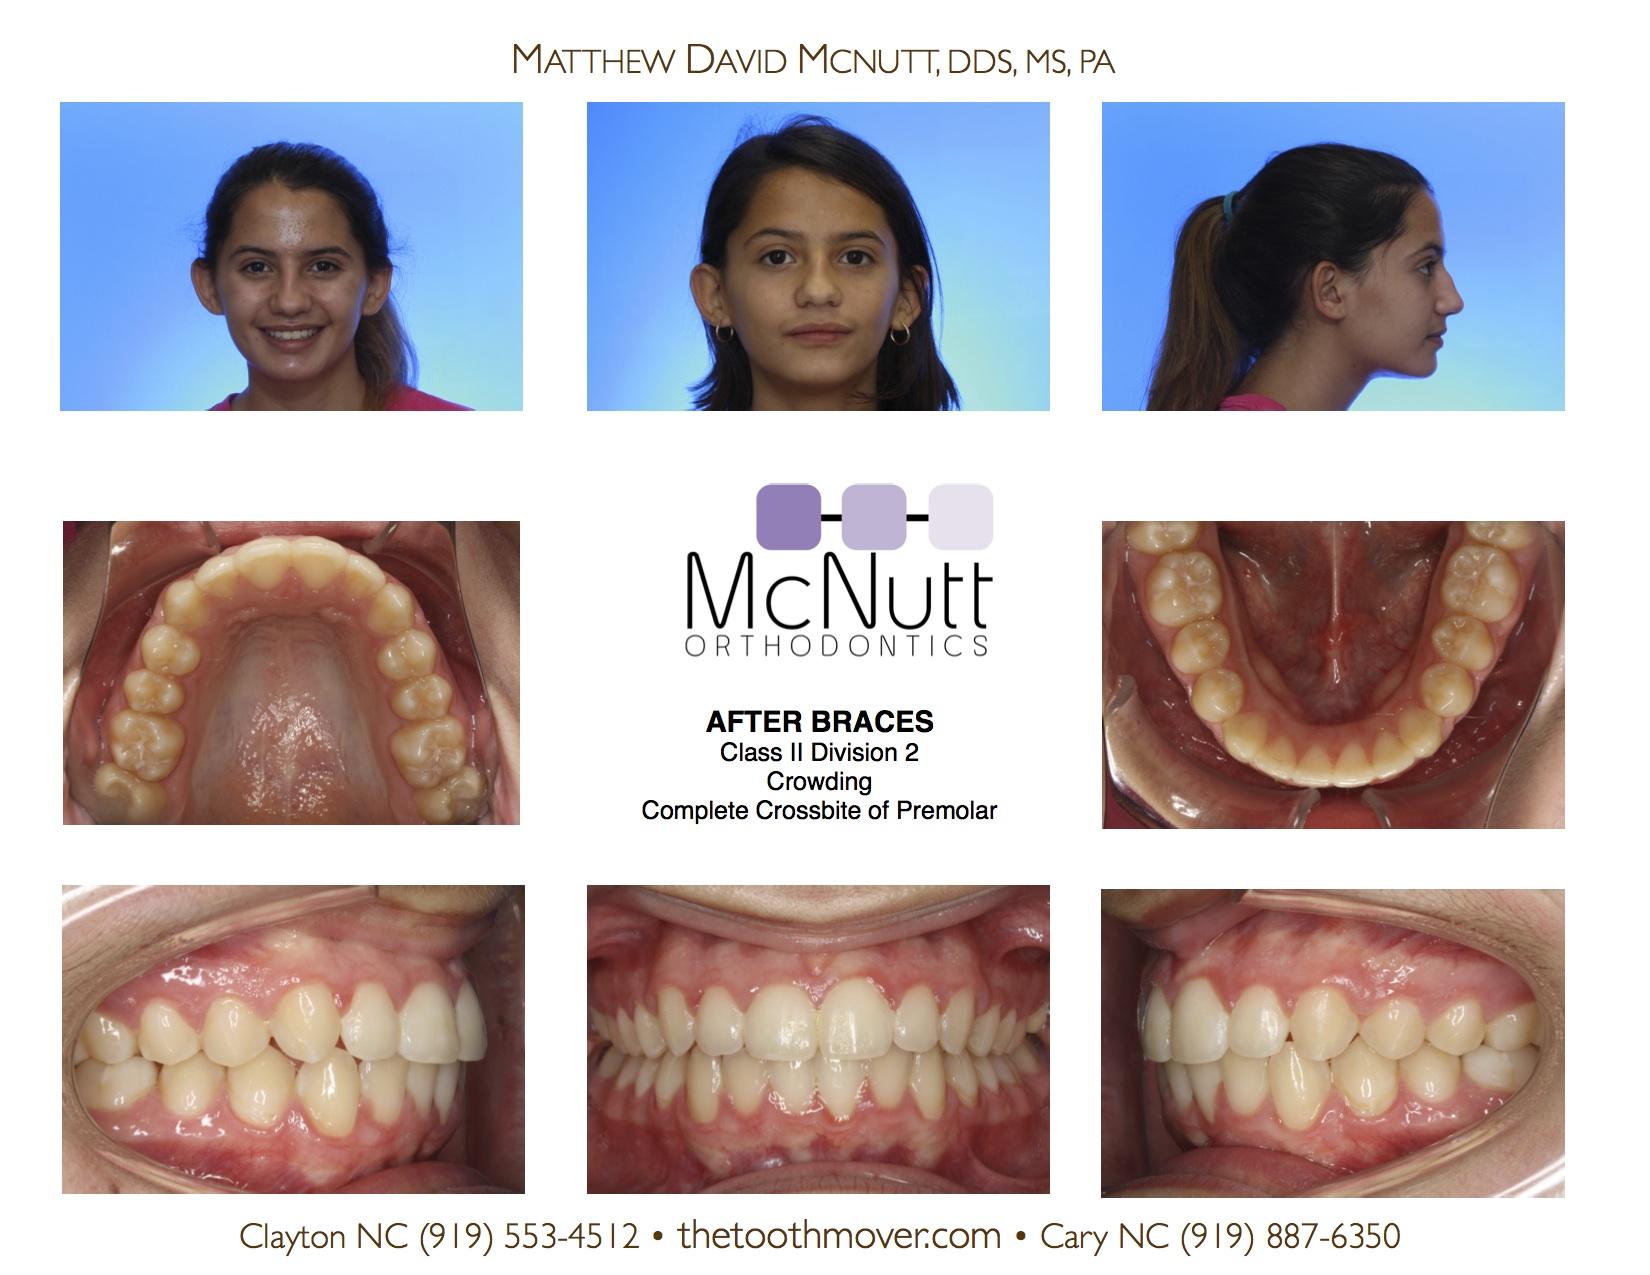 Class Ii Treatment Photos Orthodontics Cary Nc